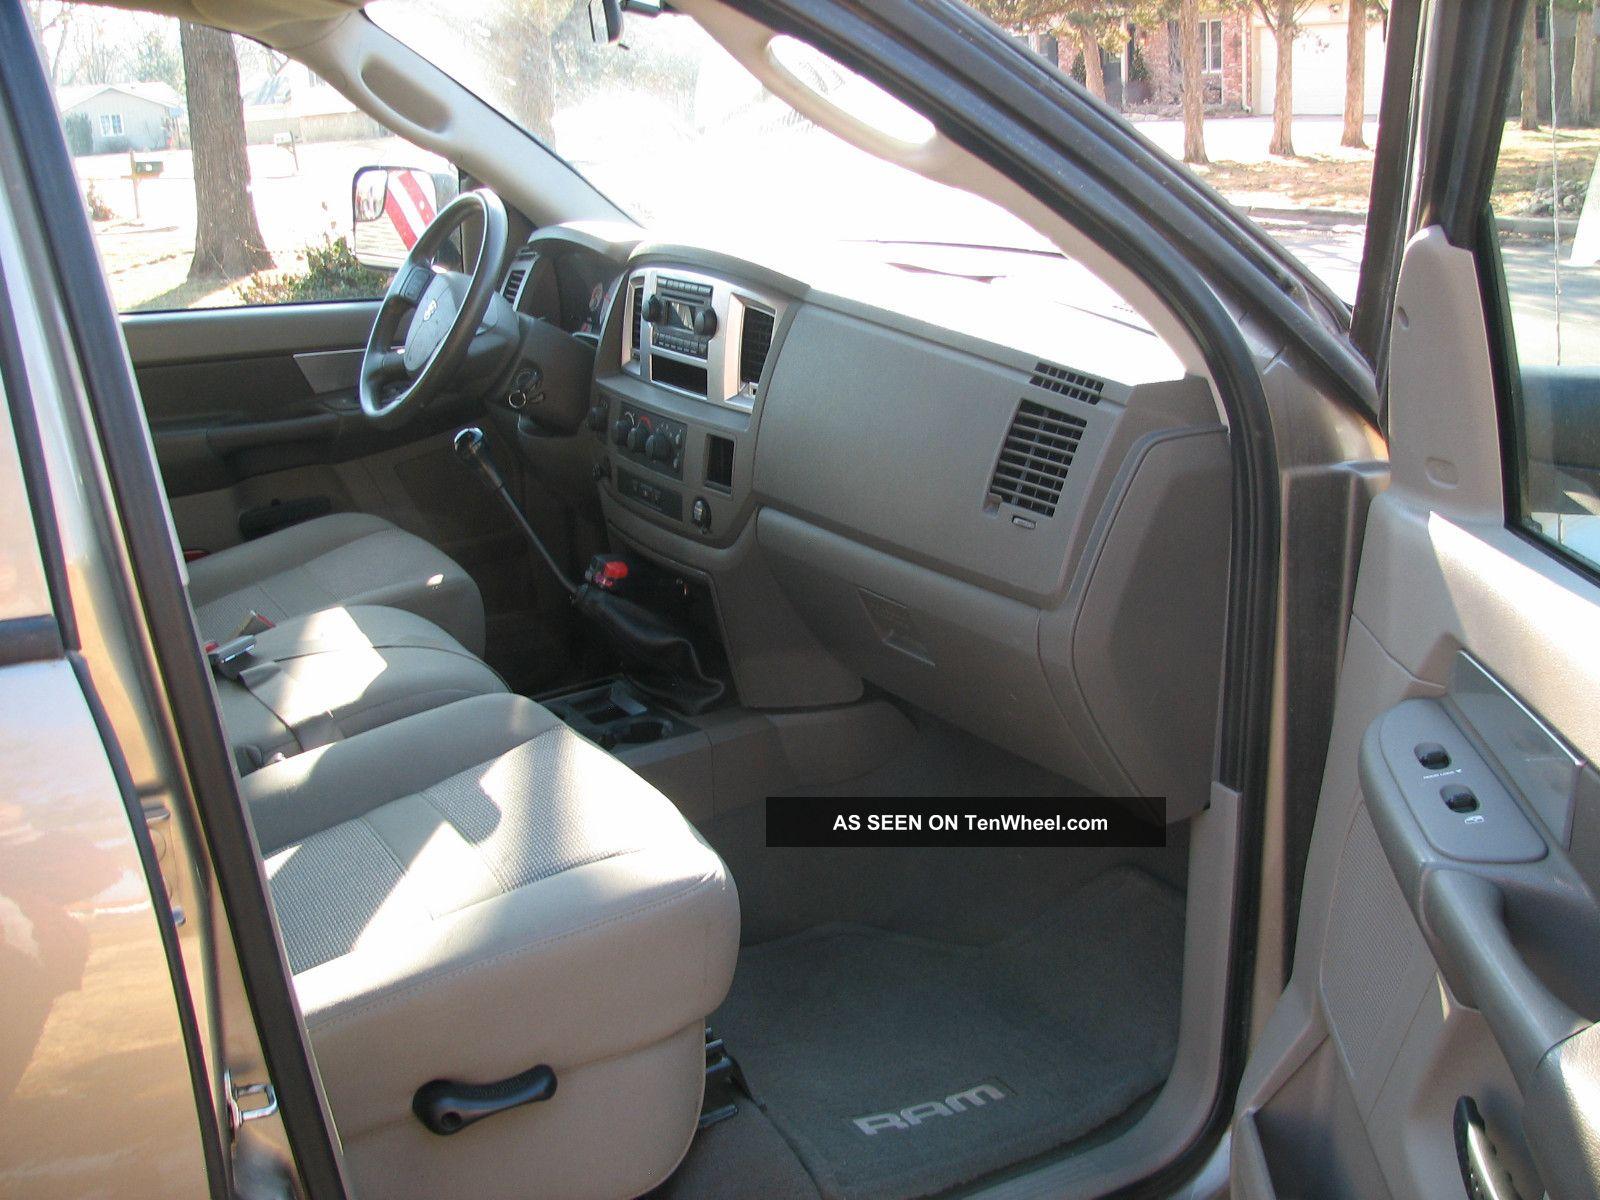 2008 Dodge Ram 2500 Sxt Mega Crew Cab Pickup 4 Door 6